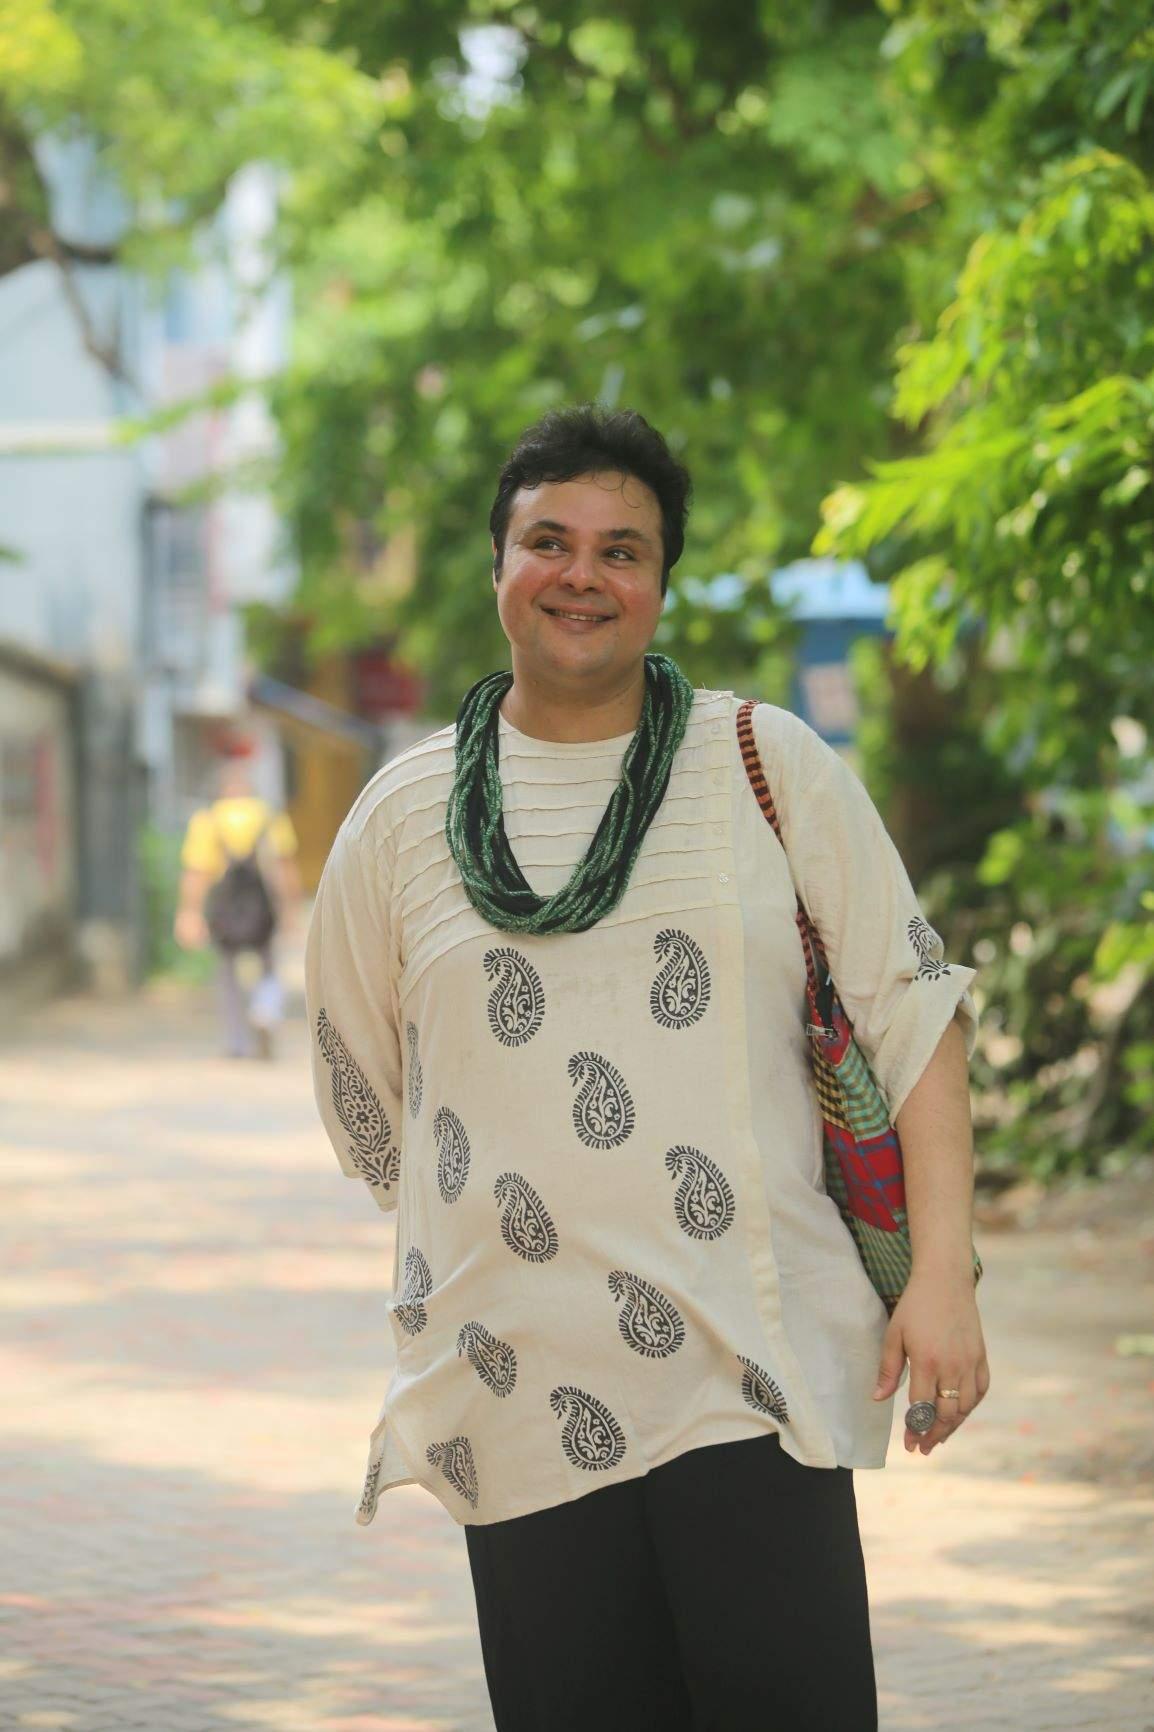 Sujoy Prosad Chatterjee